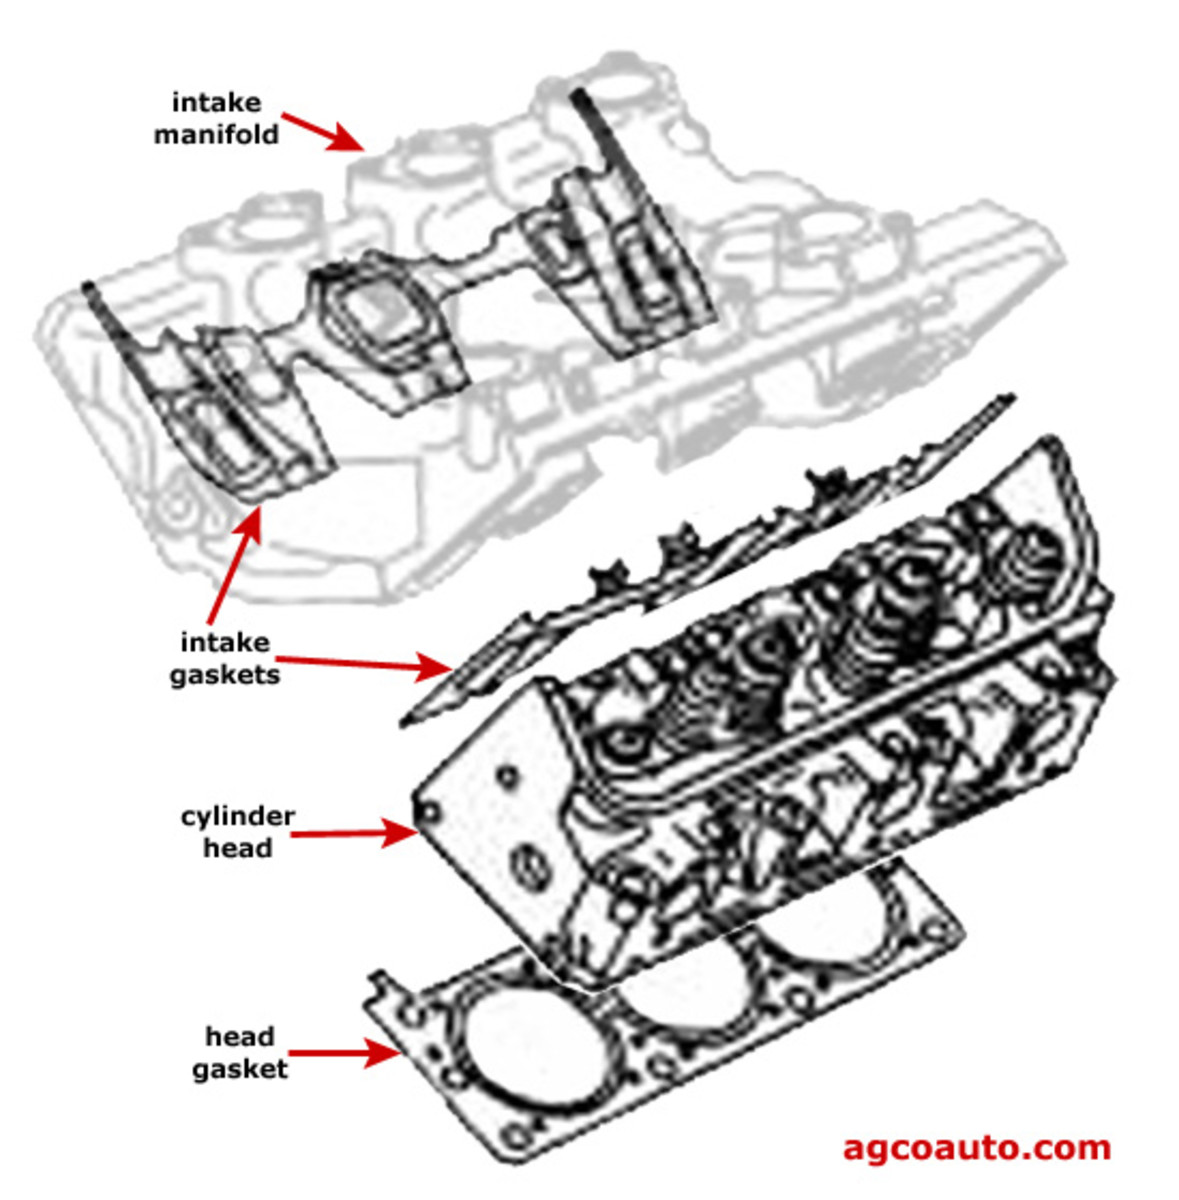 Performance Benefits Of Phenolic Intake Gaskets